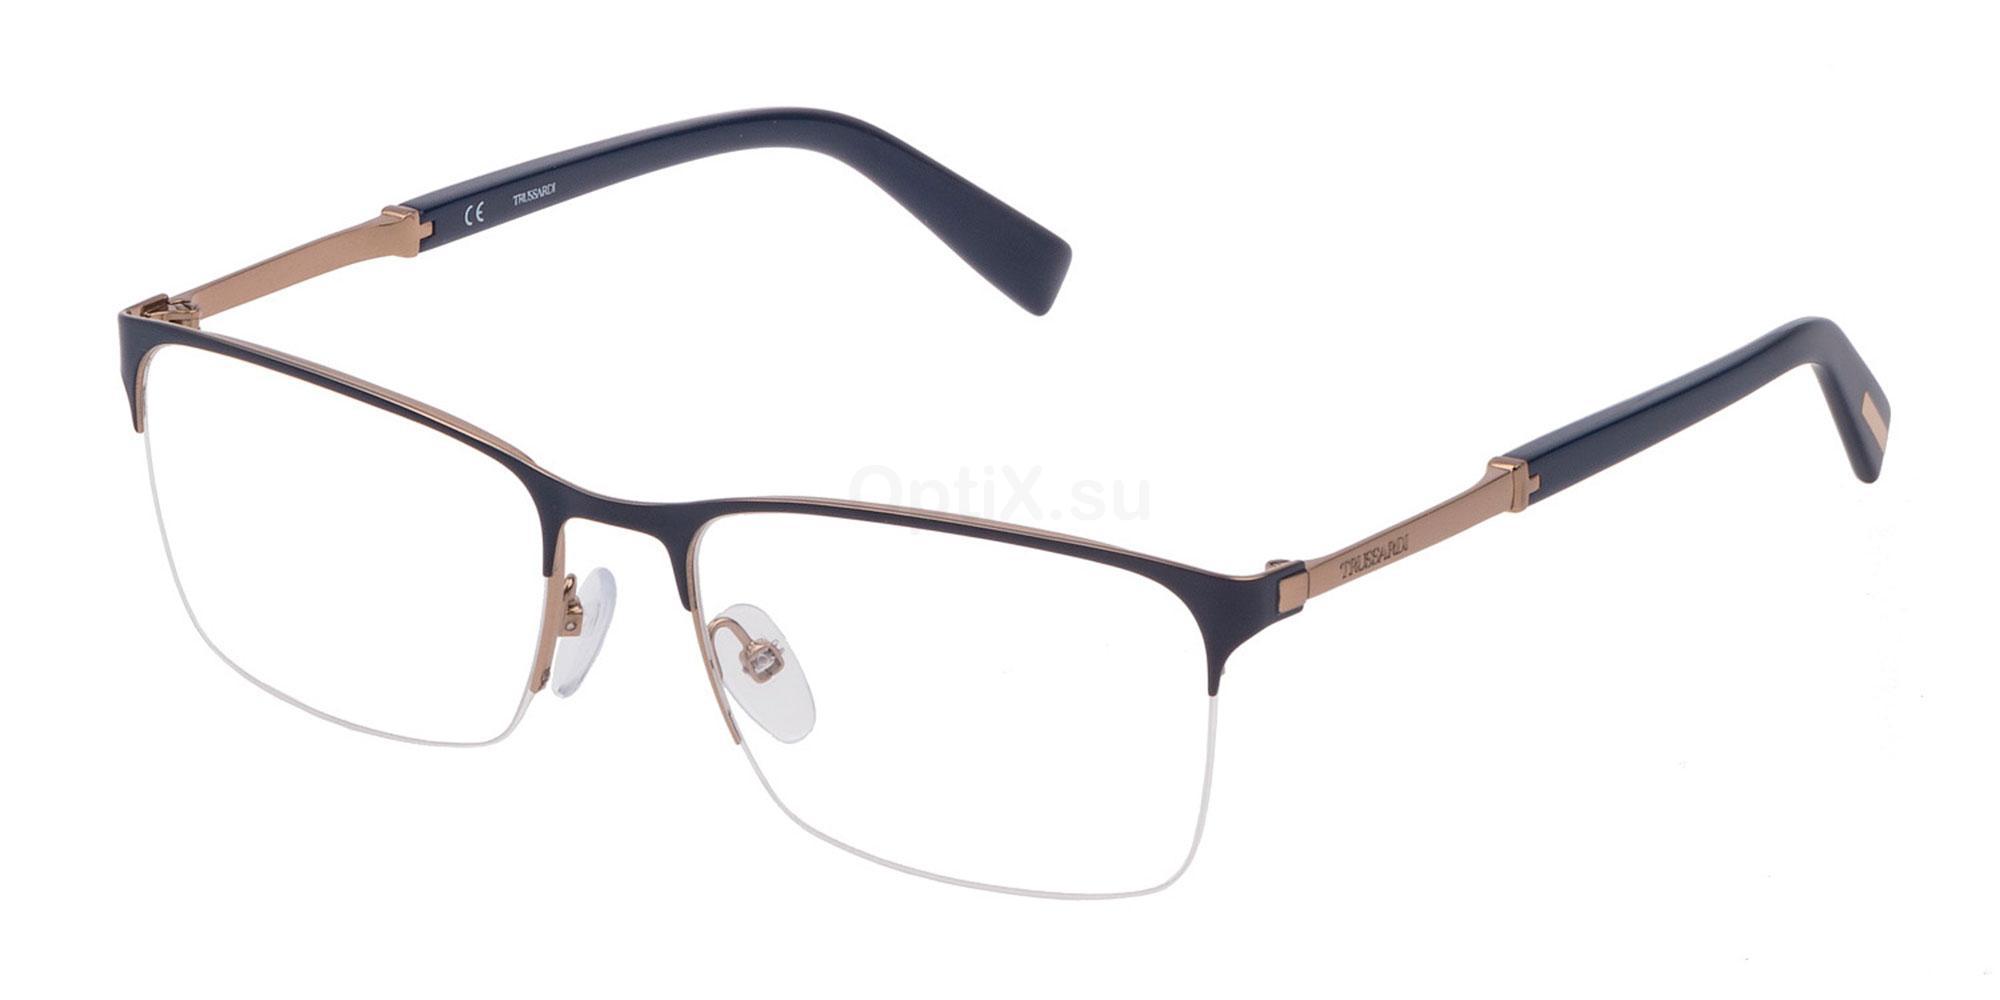 02A8 VTR357 Glasses, Trussardi